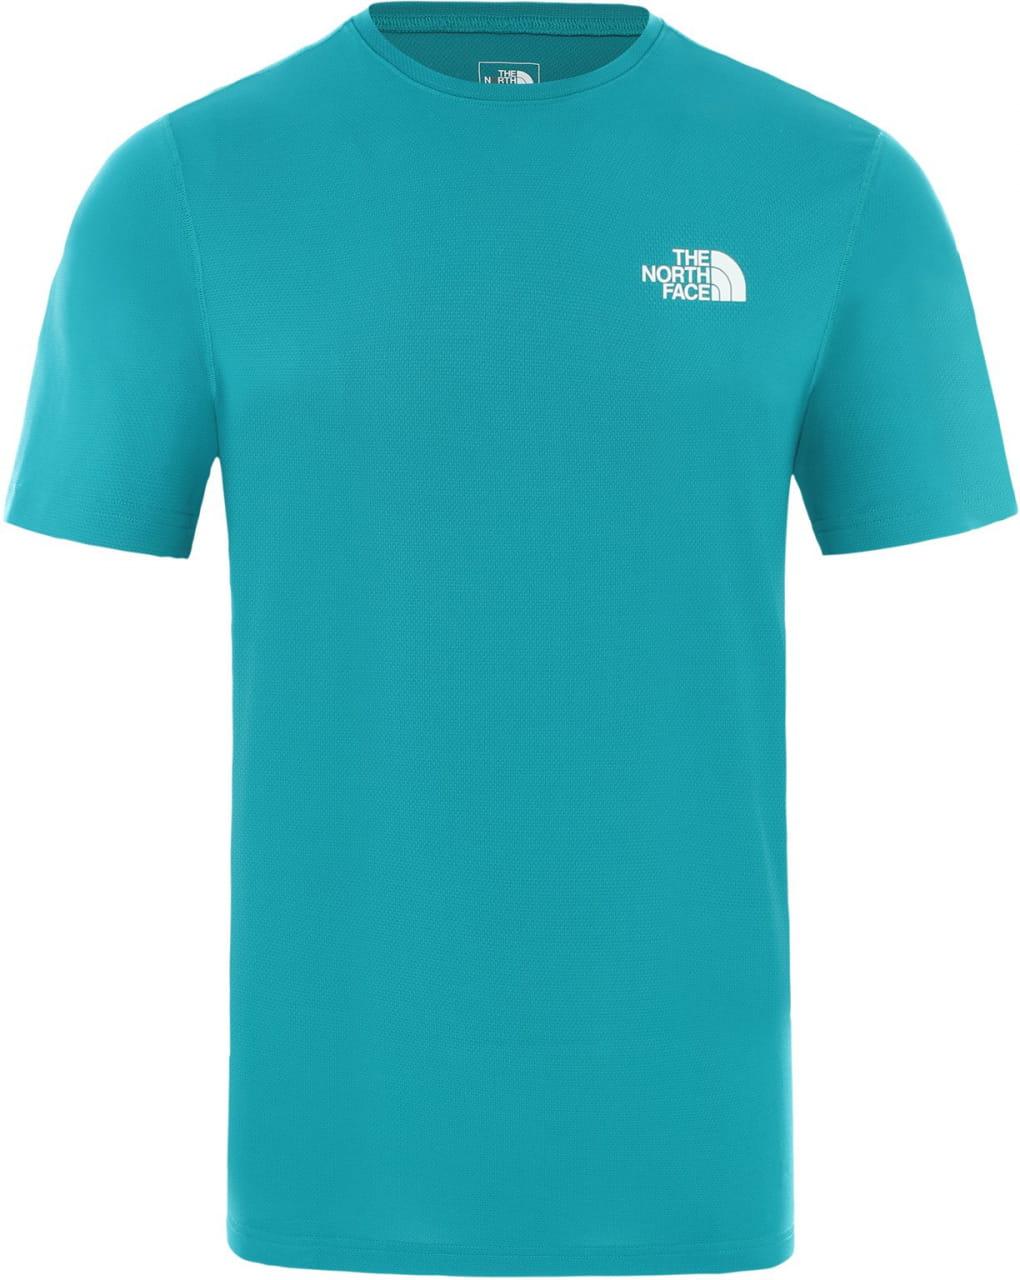 Pánské tričko The North Face Men's Flex II Short-Sleeve T-Shirt